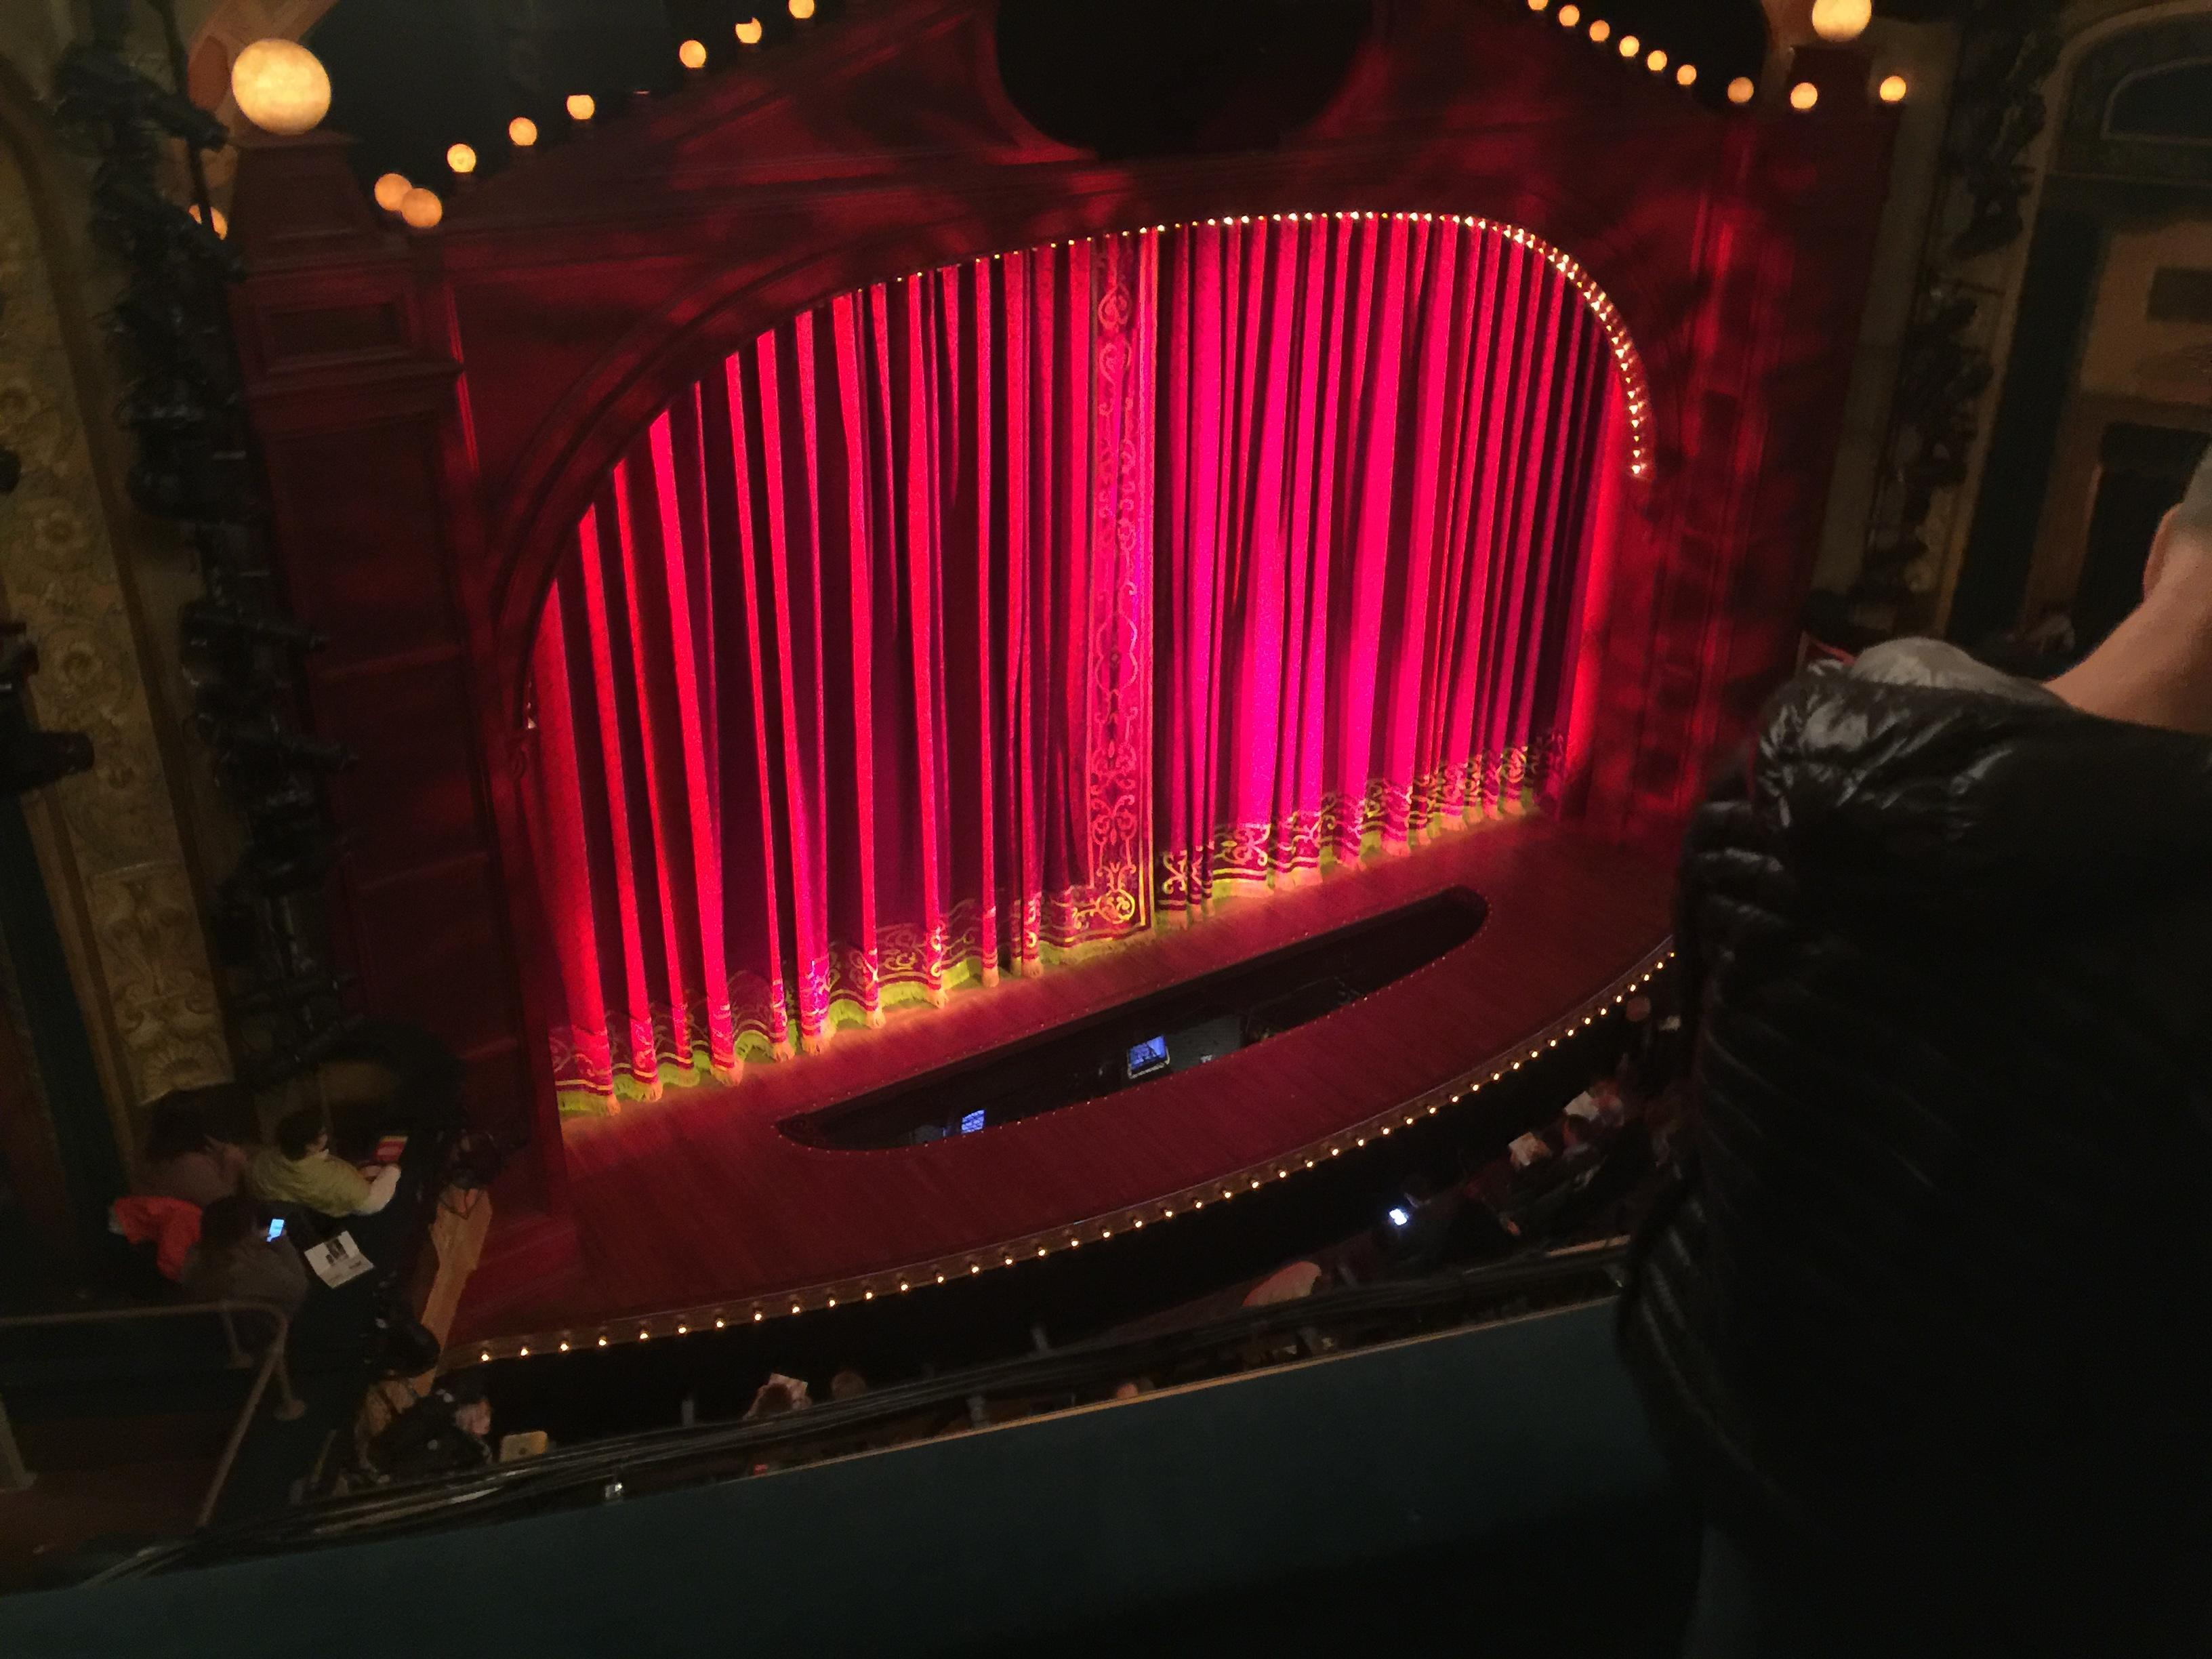 Shubert Theatre Section Balcony L Row C Seat 15